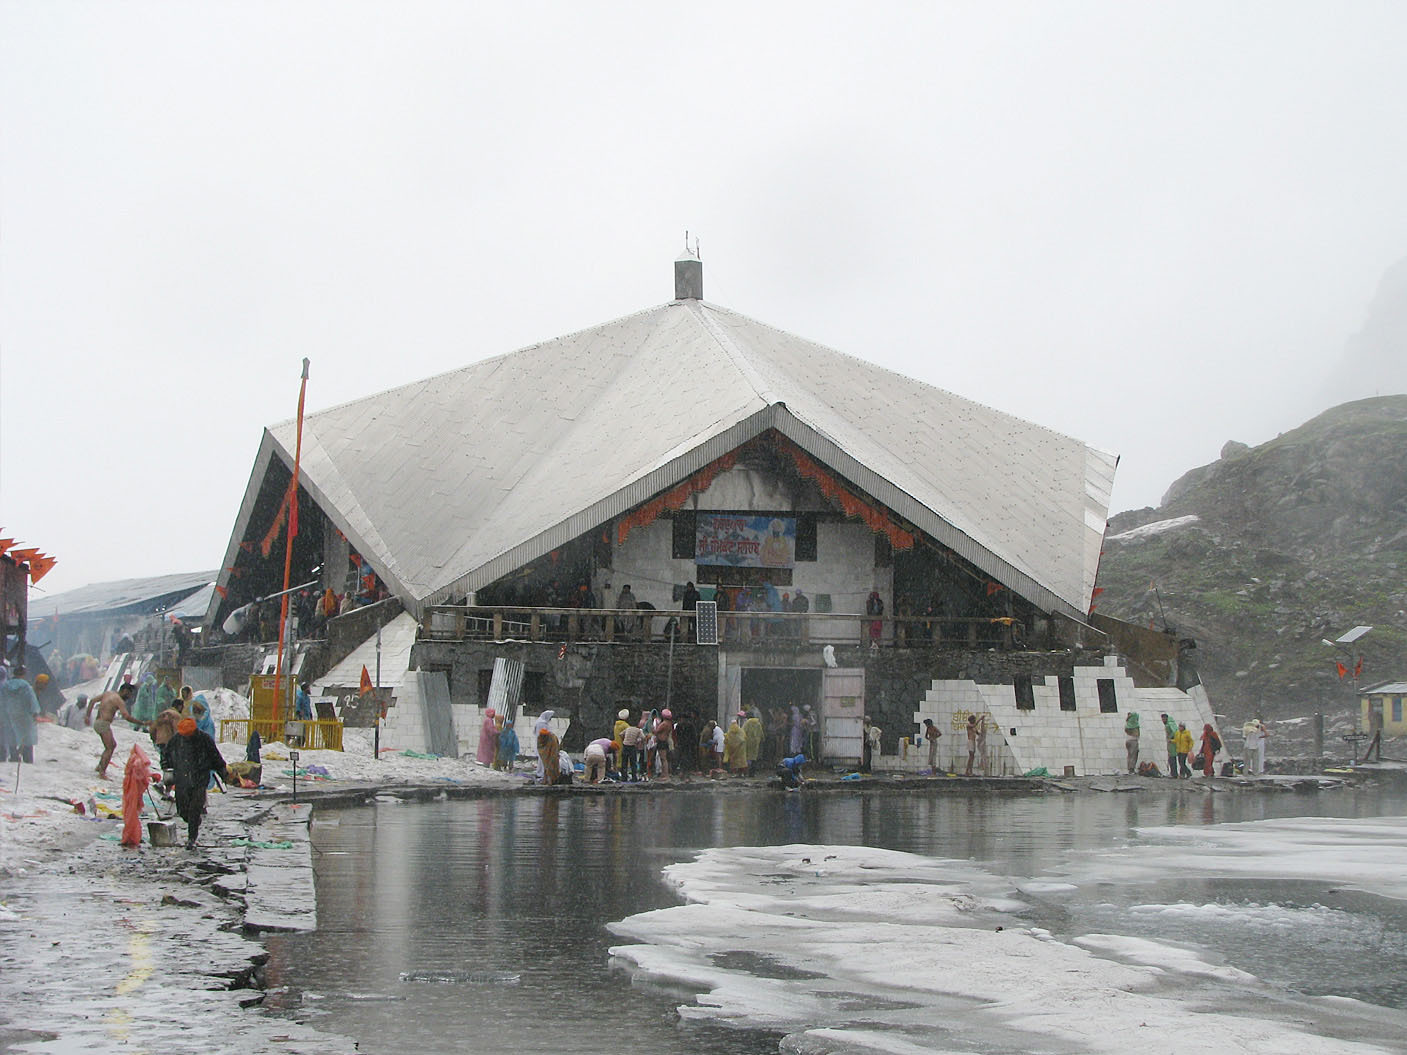 Gurudwara Hemkund Sahib, an important pilgrimage site for Sikhs.